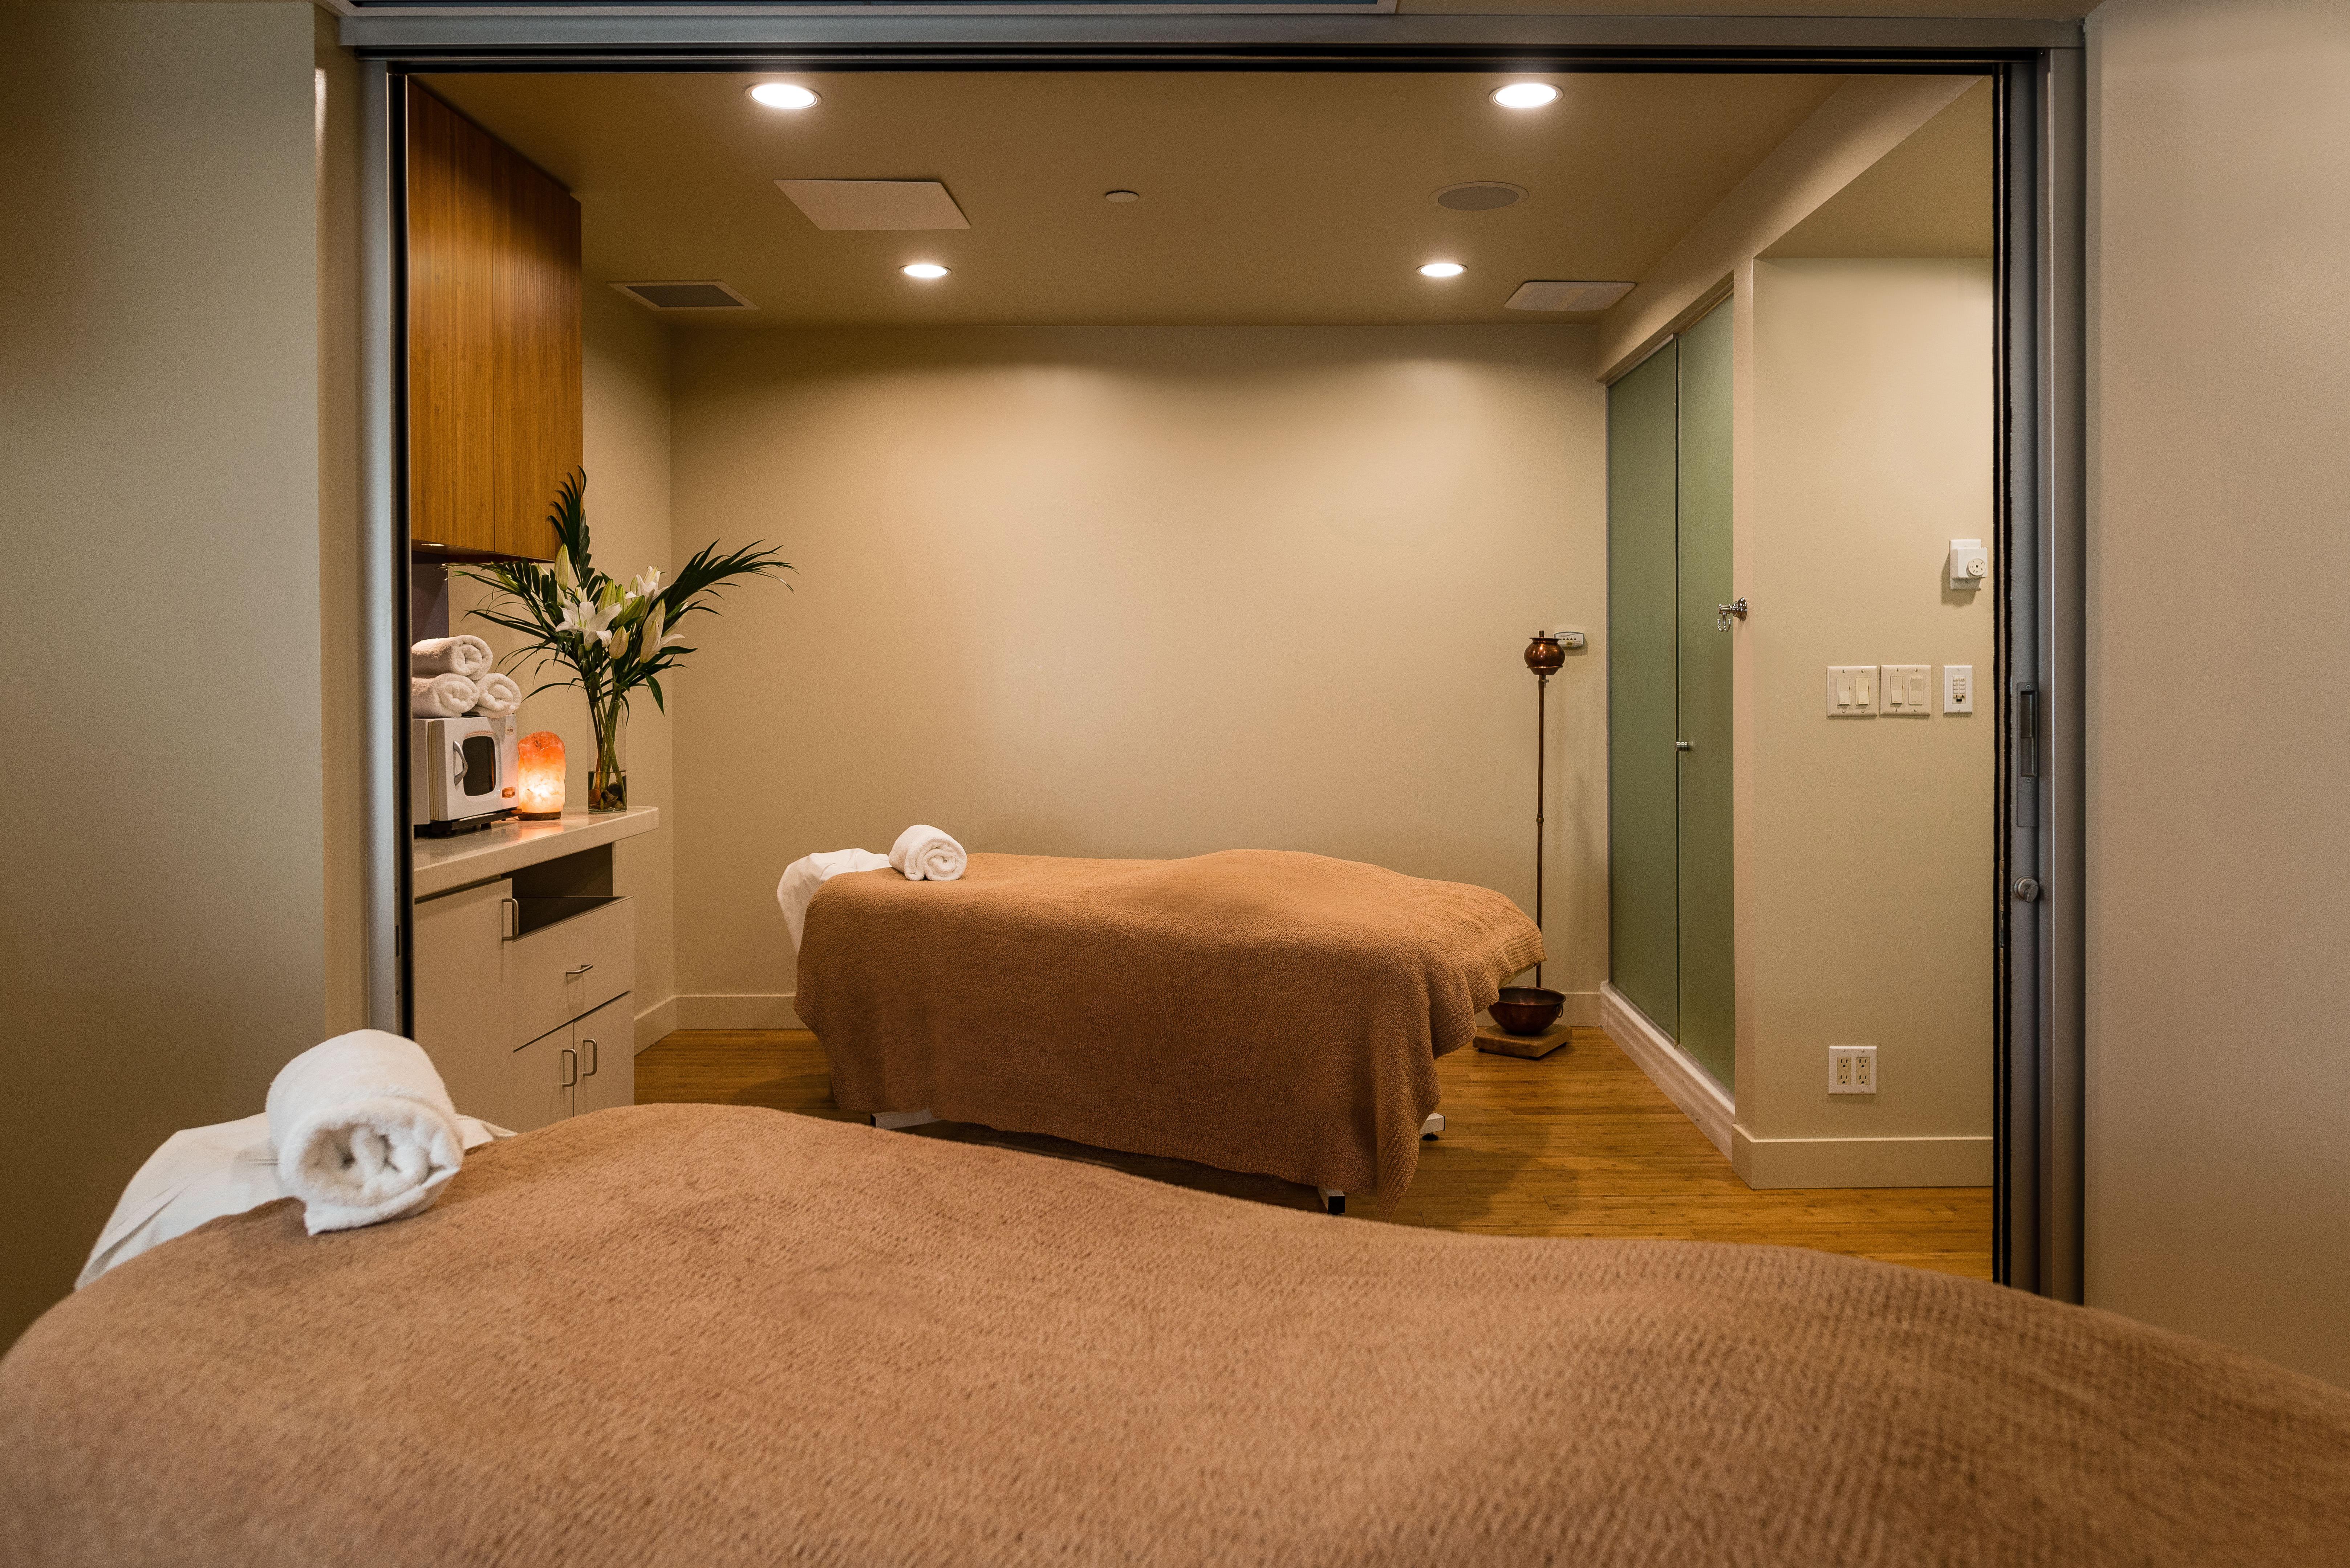 upscale spas top spas in vancouver vida spa. Black Bedroom Furniture Sets. Home Design Ideas